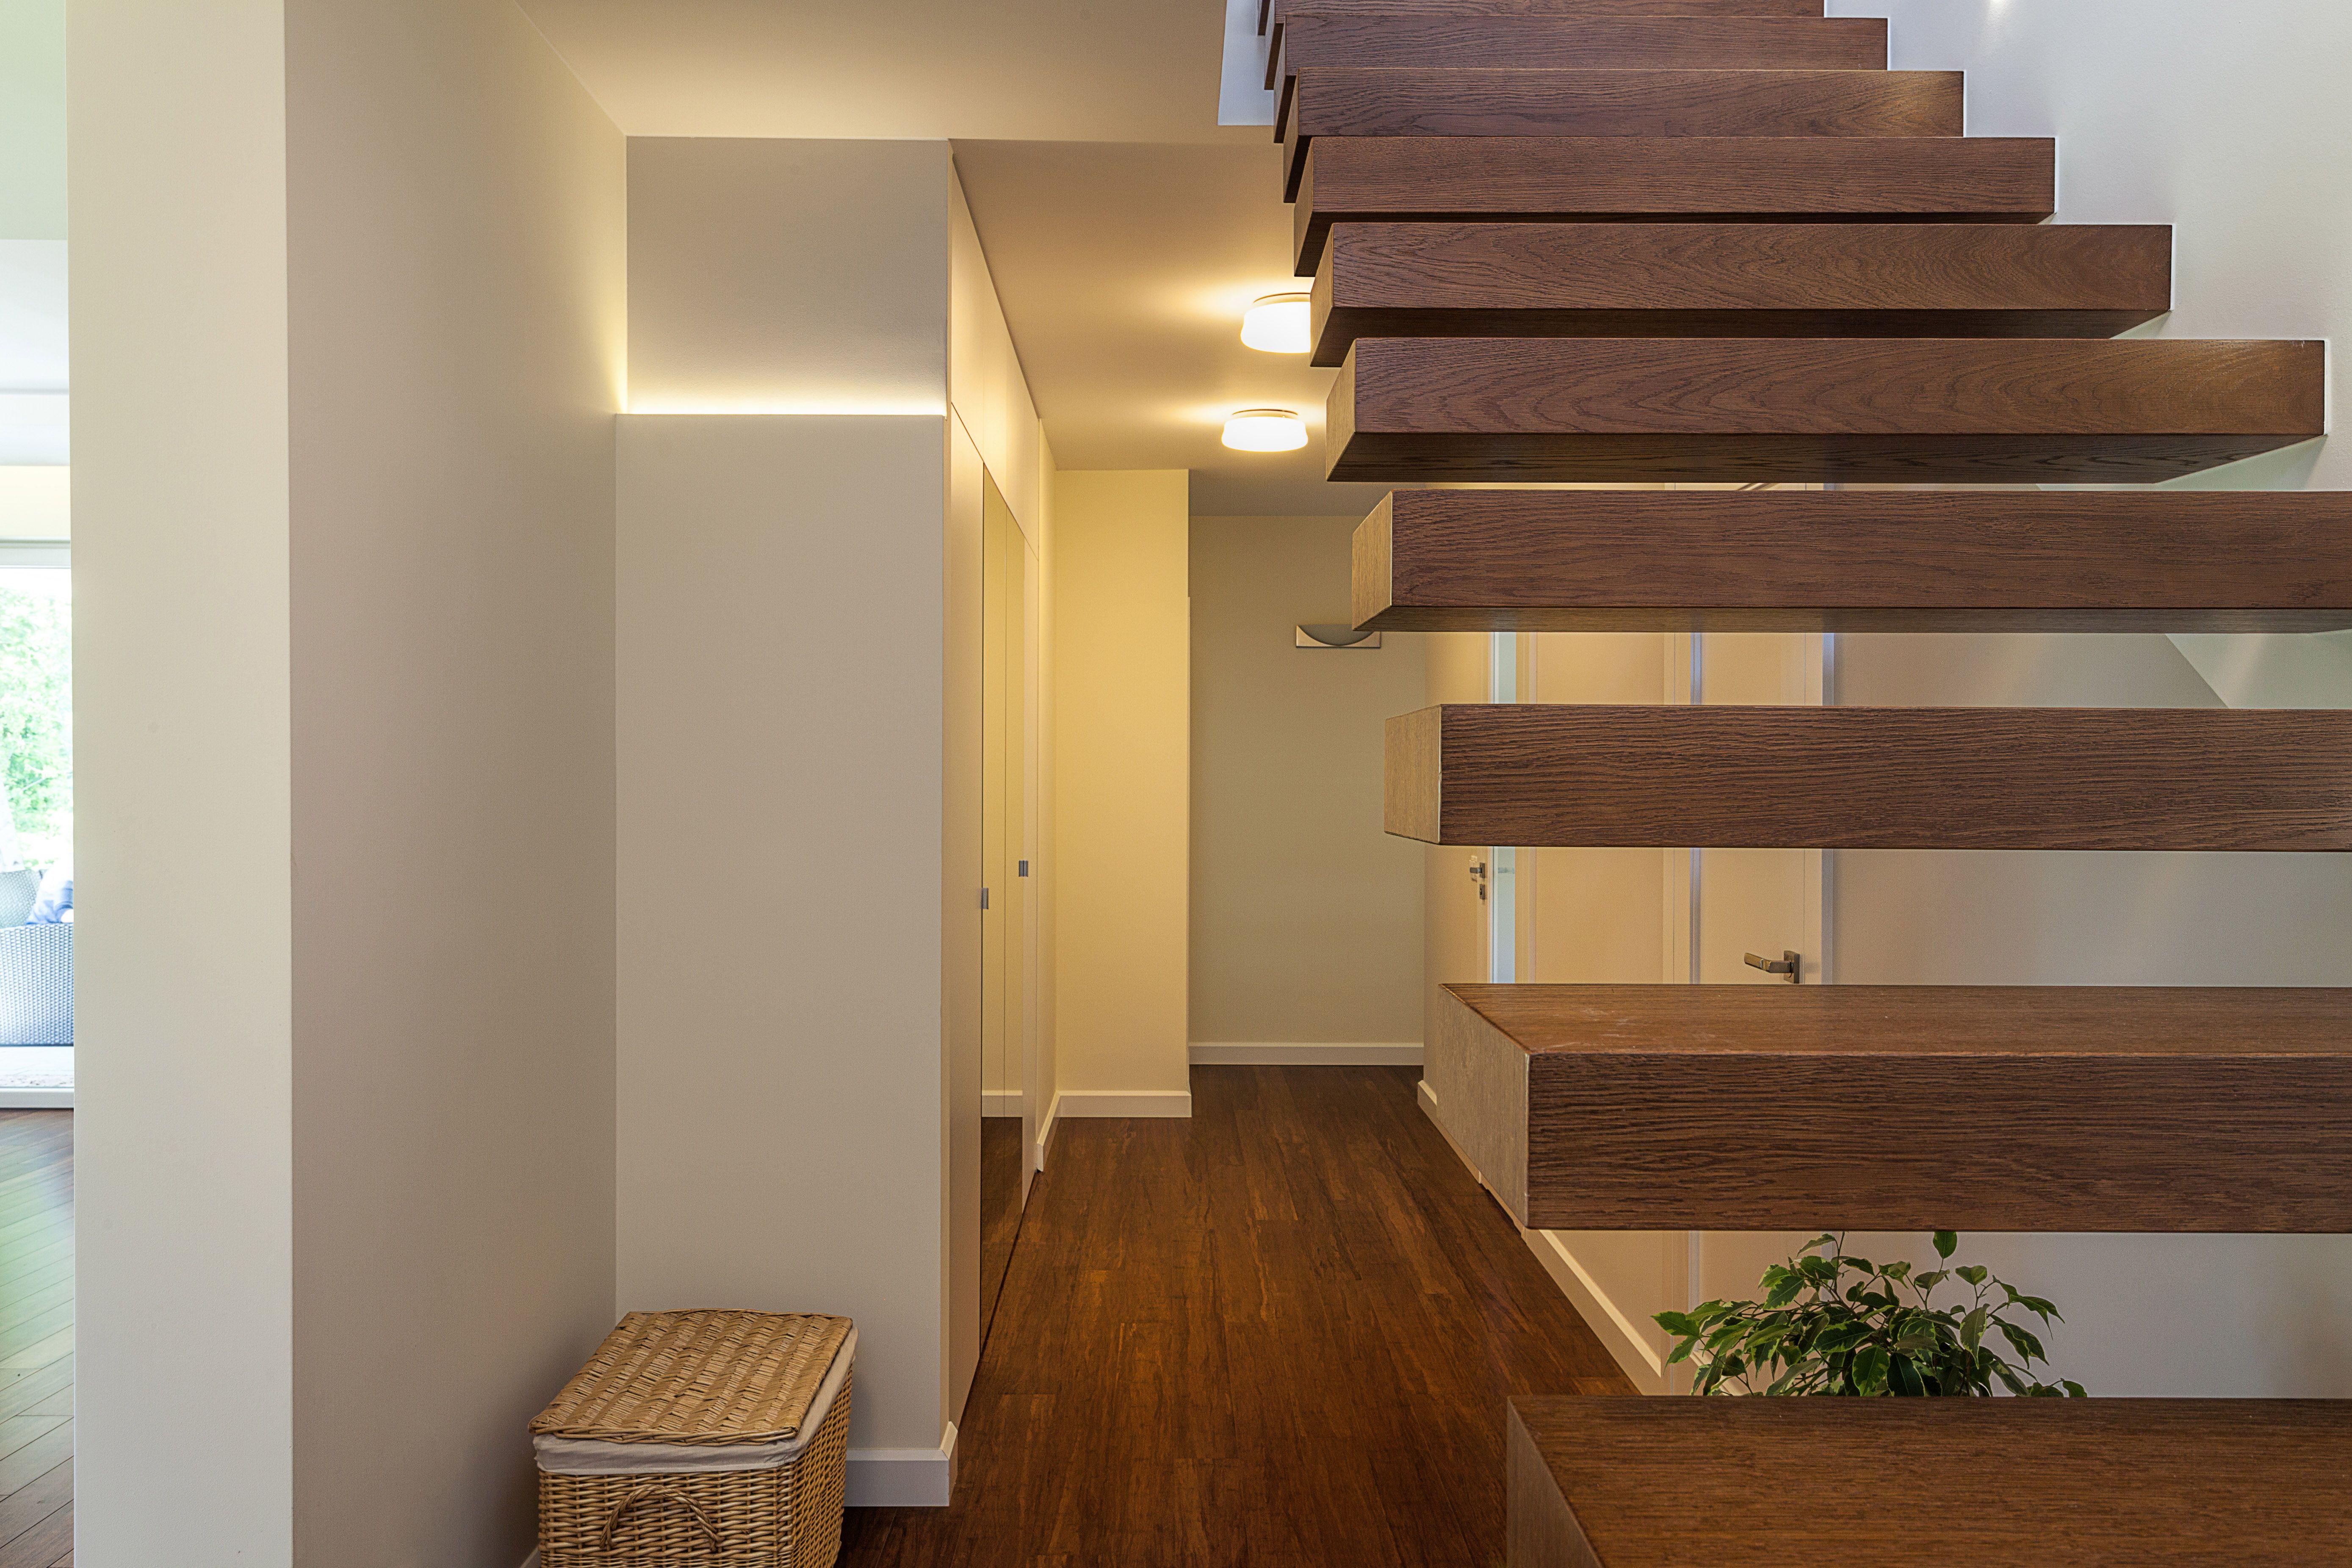 No Railing - Minimalist Staircase - Simply Beautiful ...